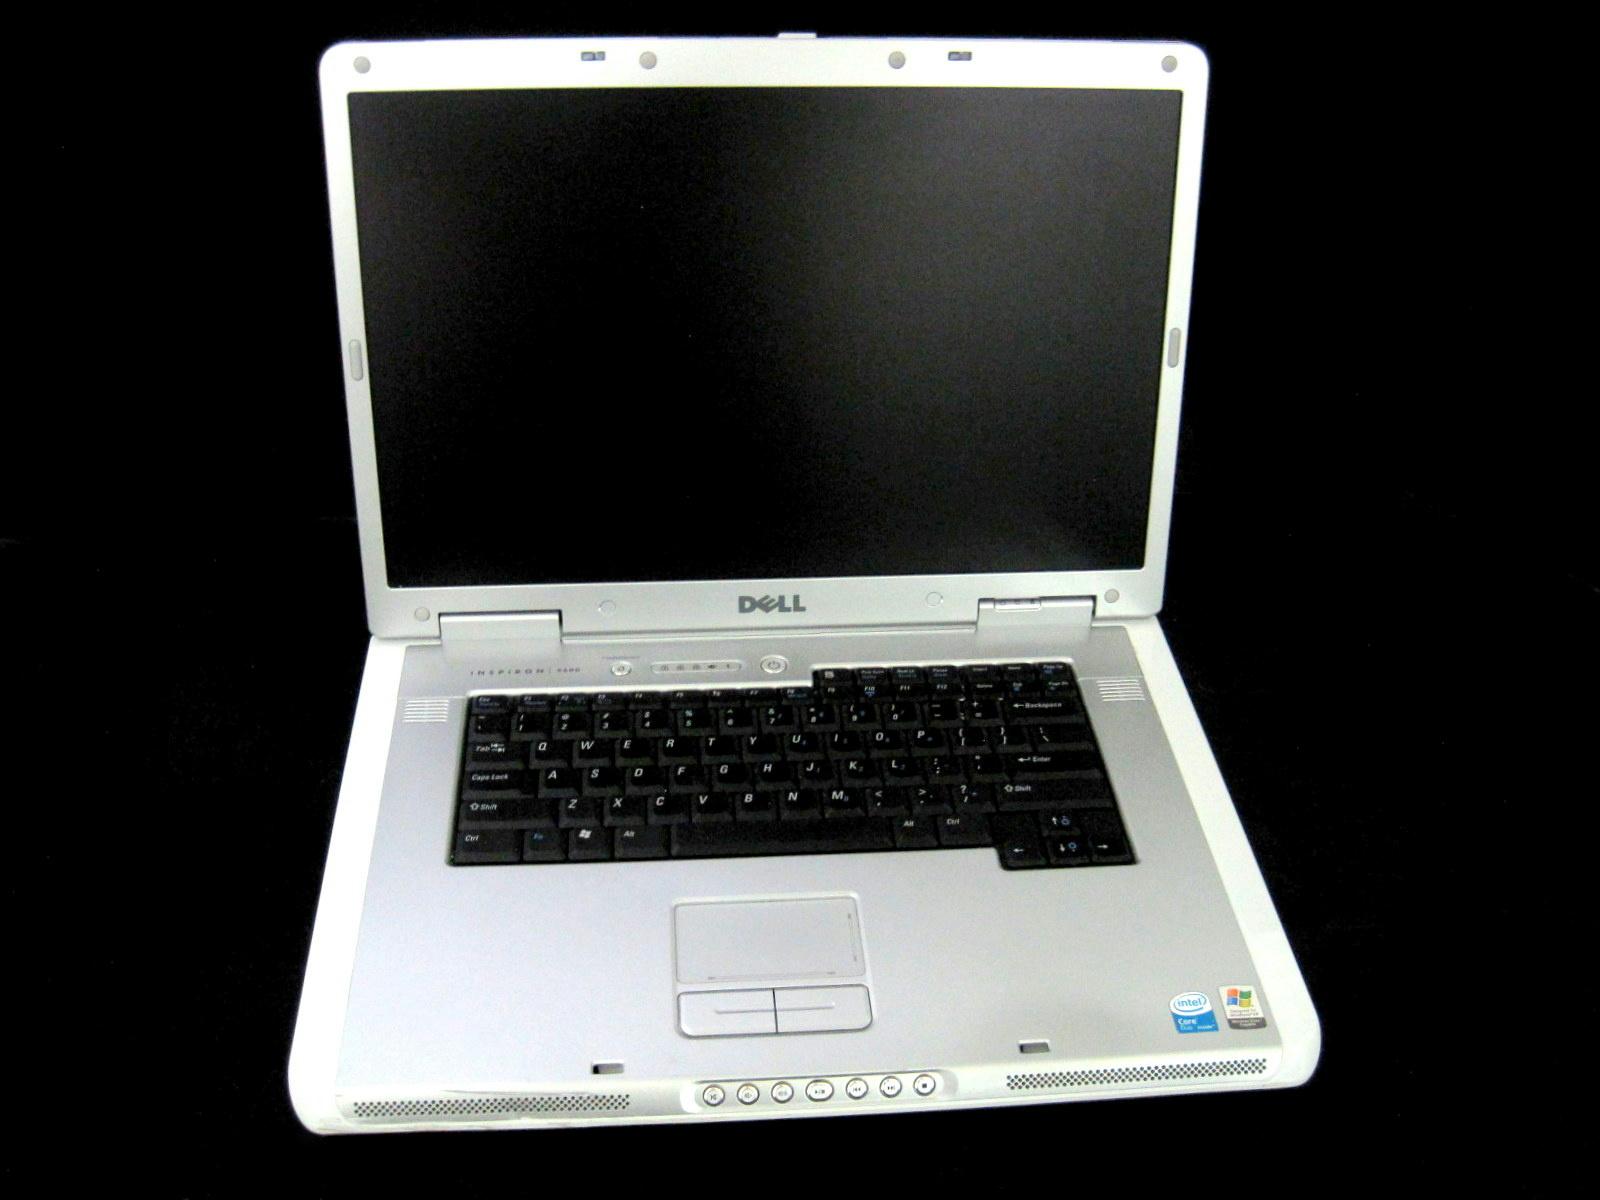 Dell Inspiron 9400 Core 2 Duo T2250 2GB DDR2 80GB HDD